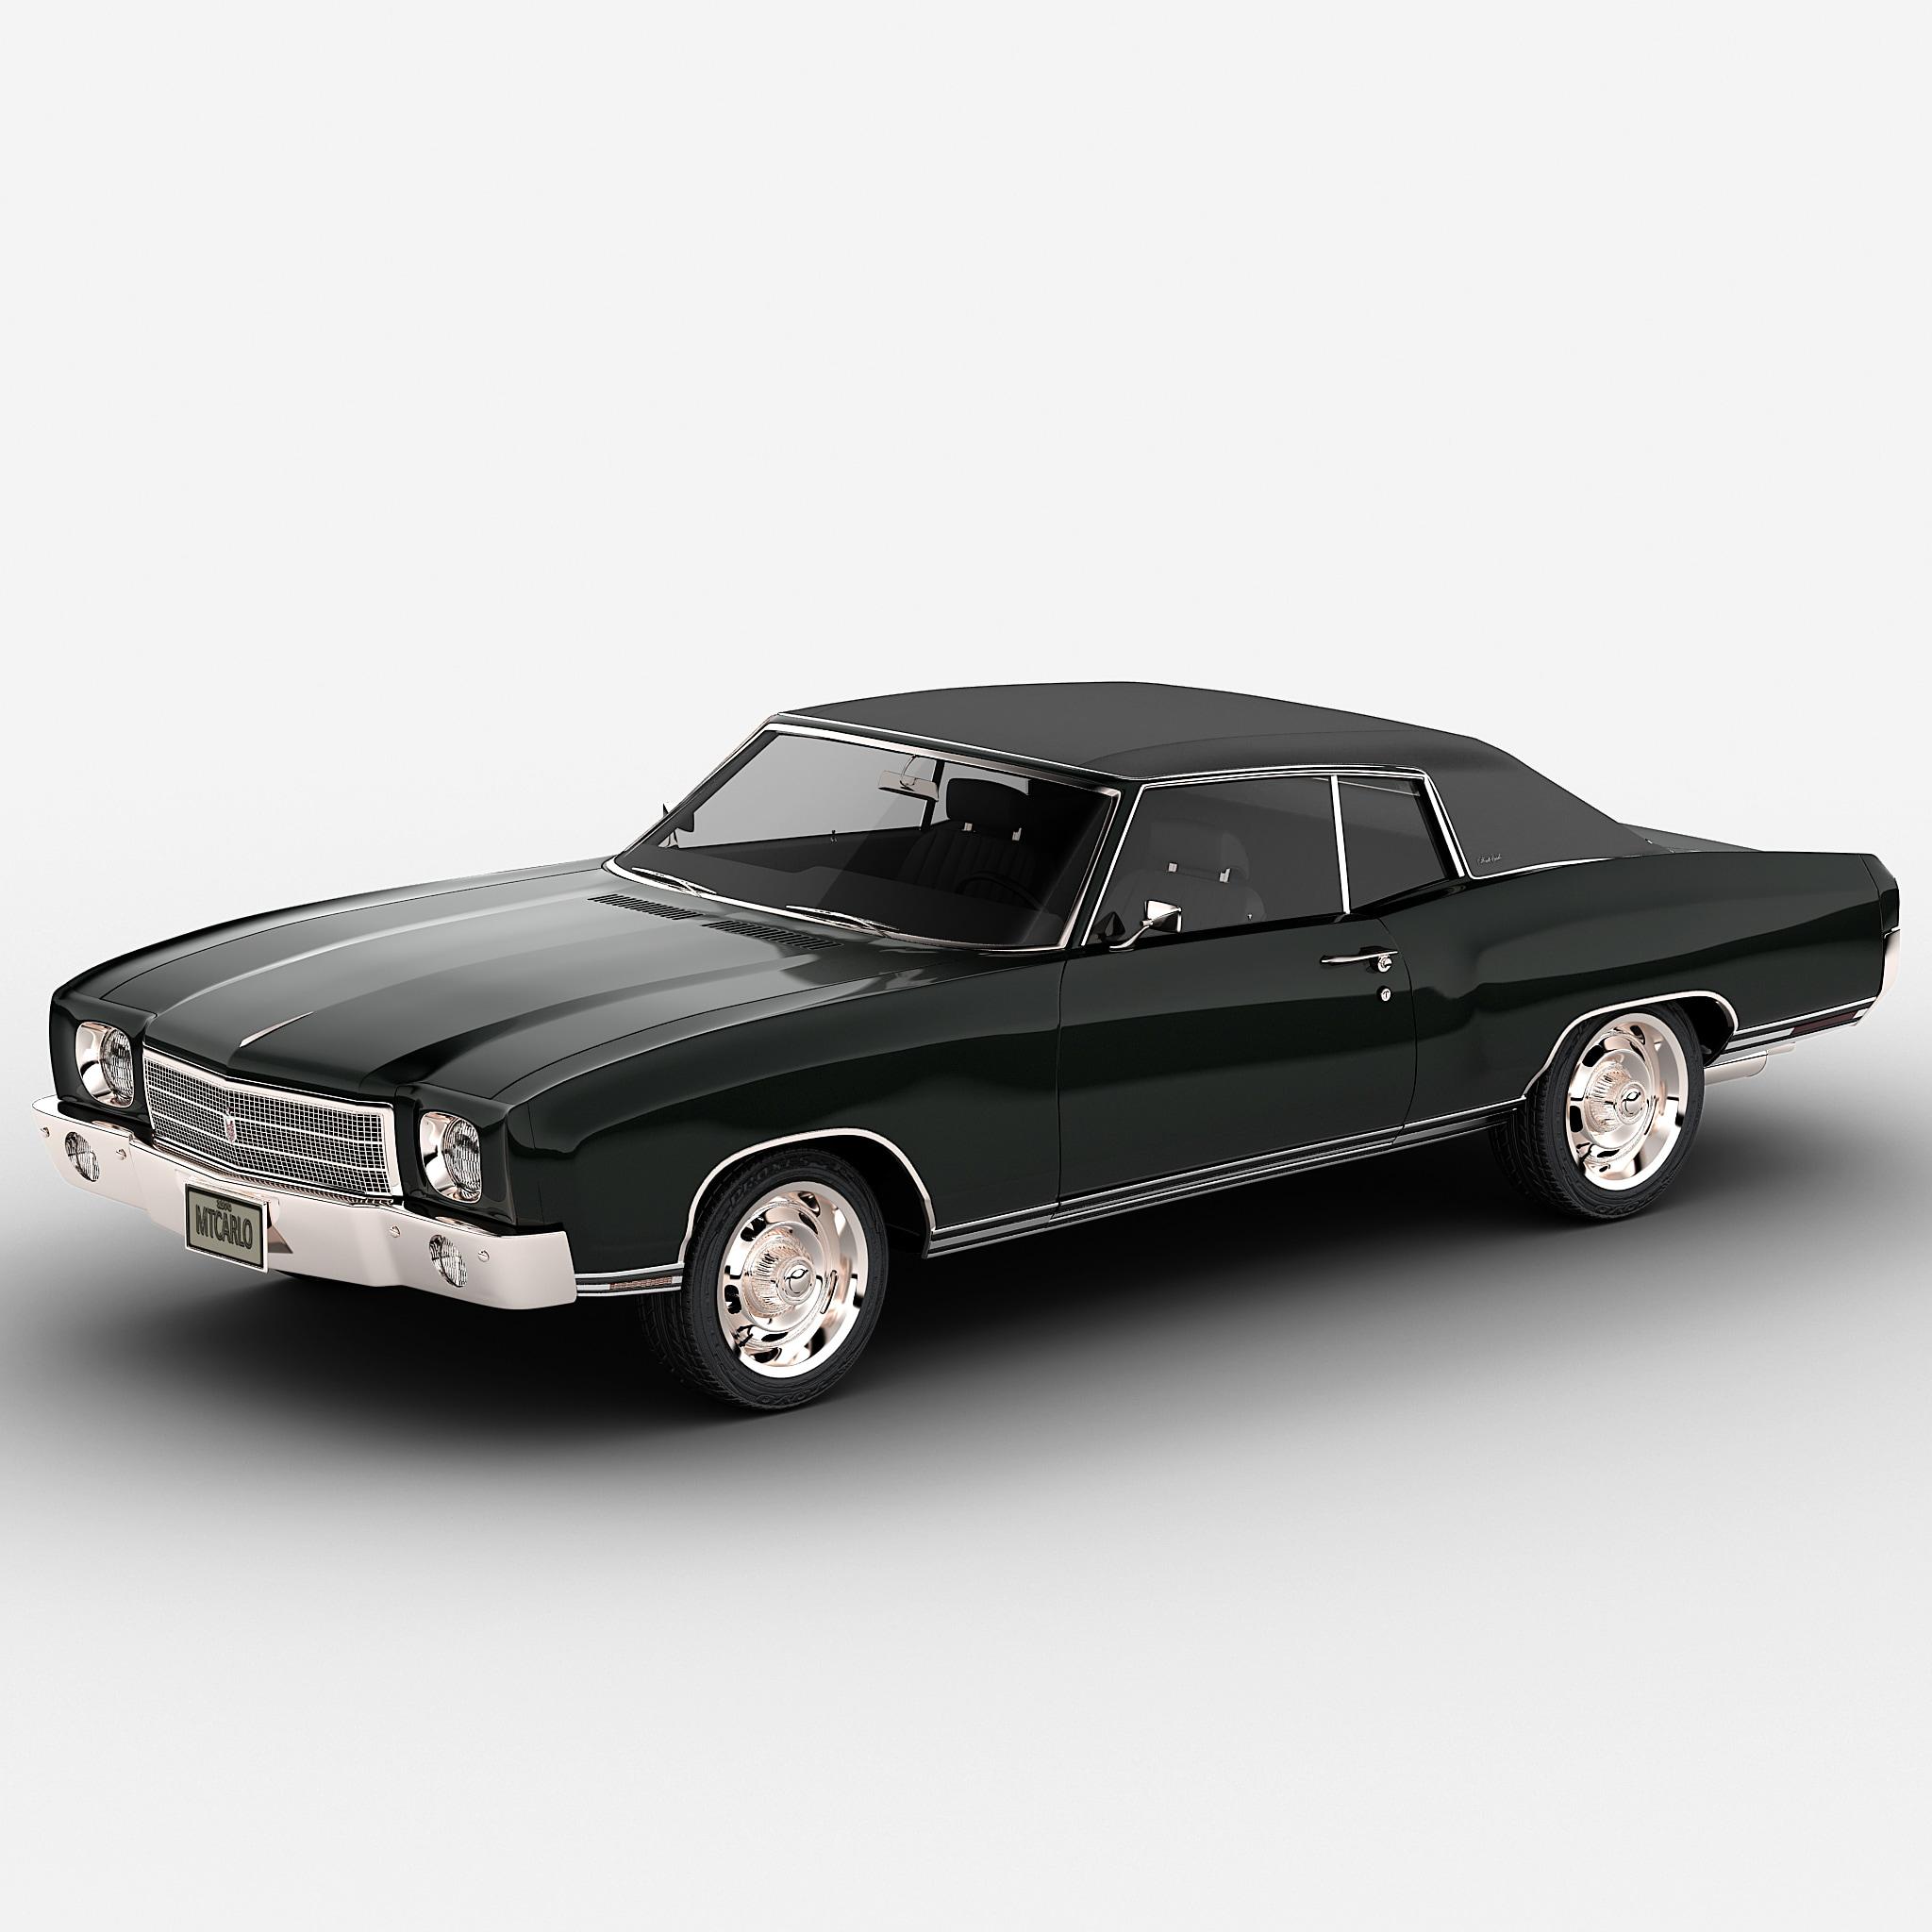 Chevrolet Monte Carlo 1970_2.jpg